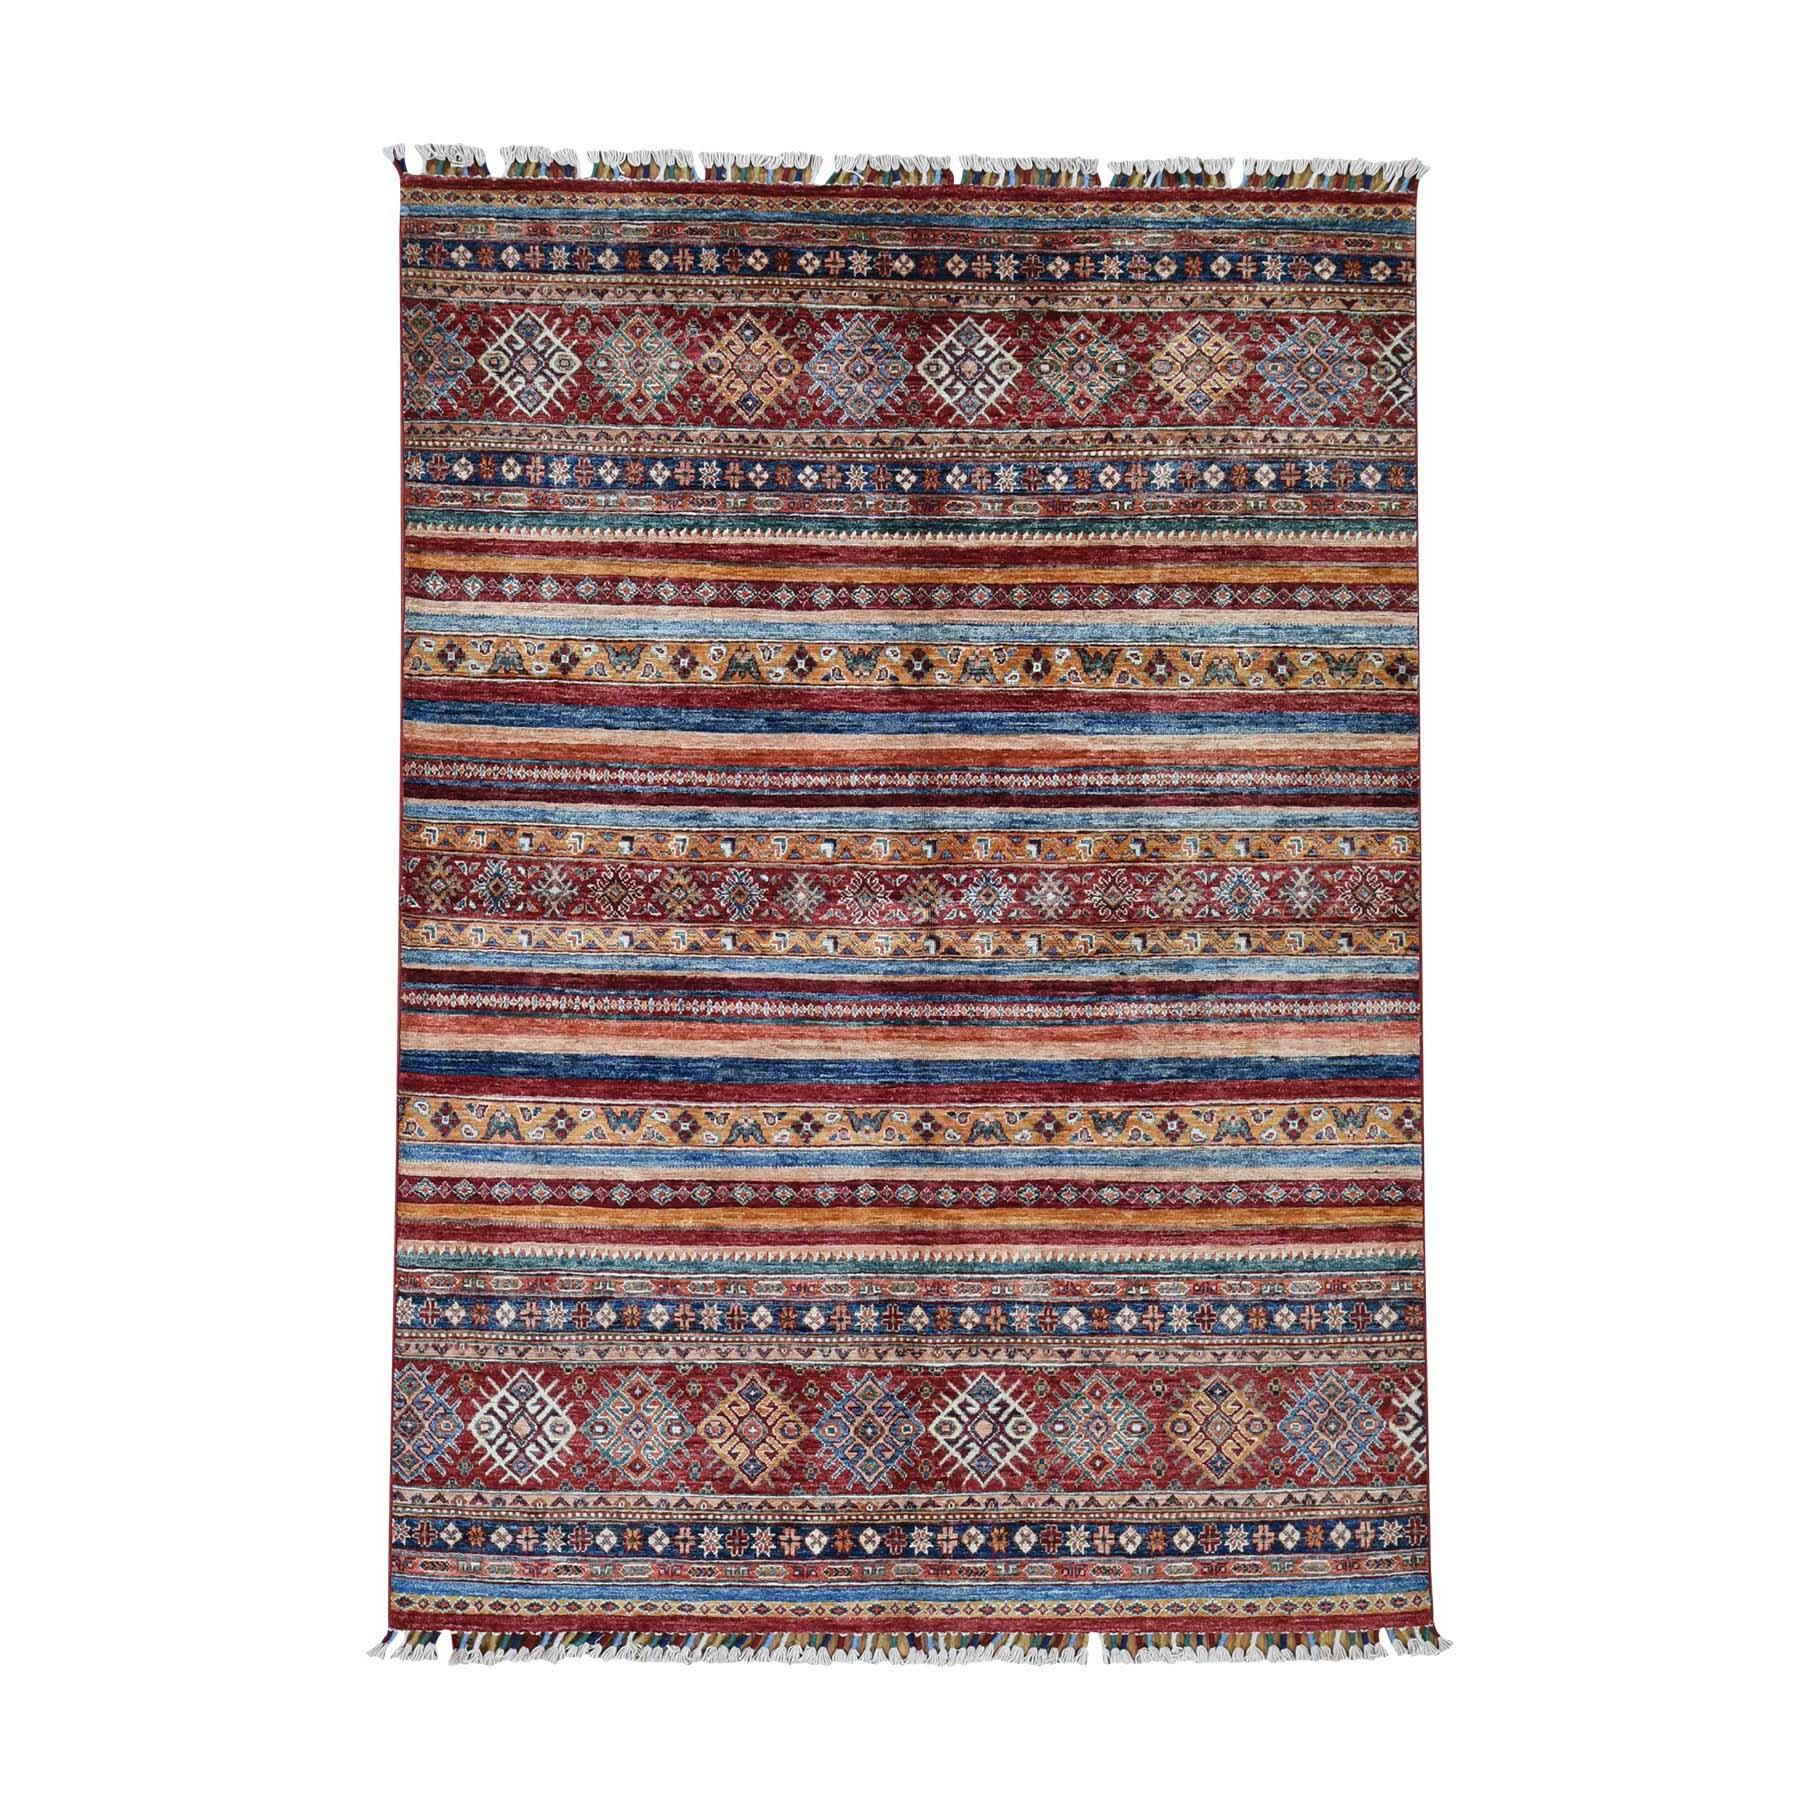 "5'X6'10""  Khorjin Design Super Kazak Hand-Knotted Pure Wool Oriental Rug moadcebb"